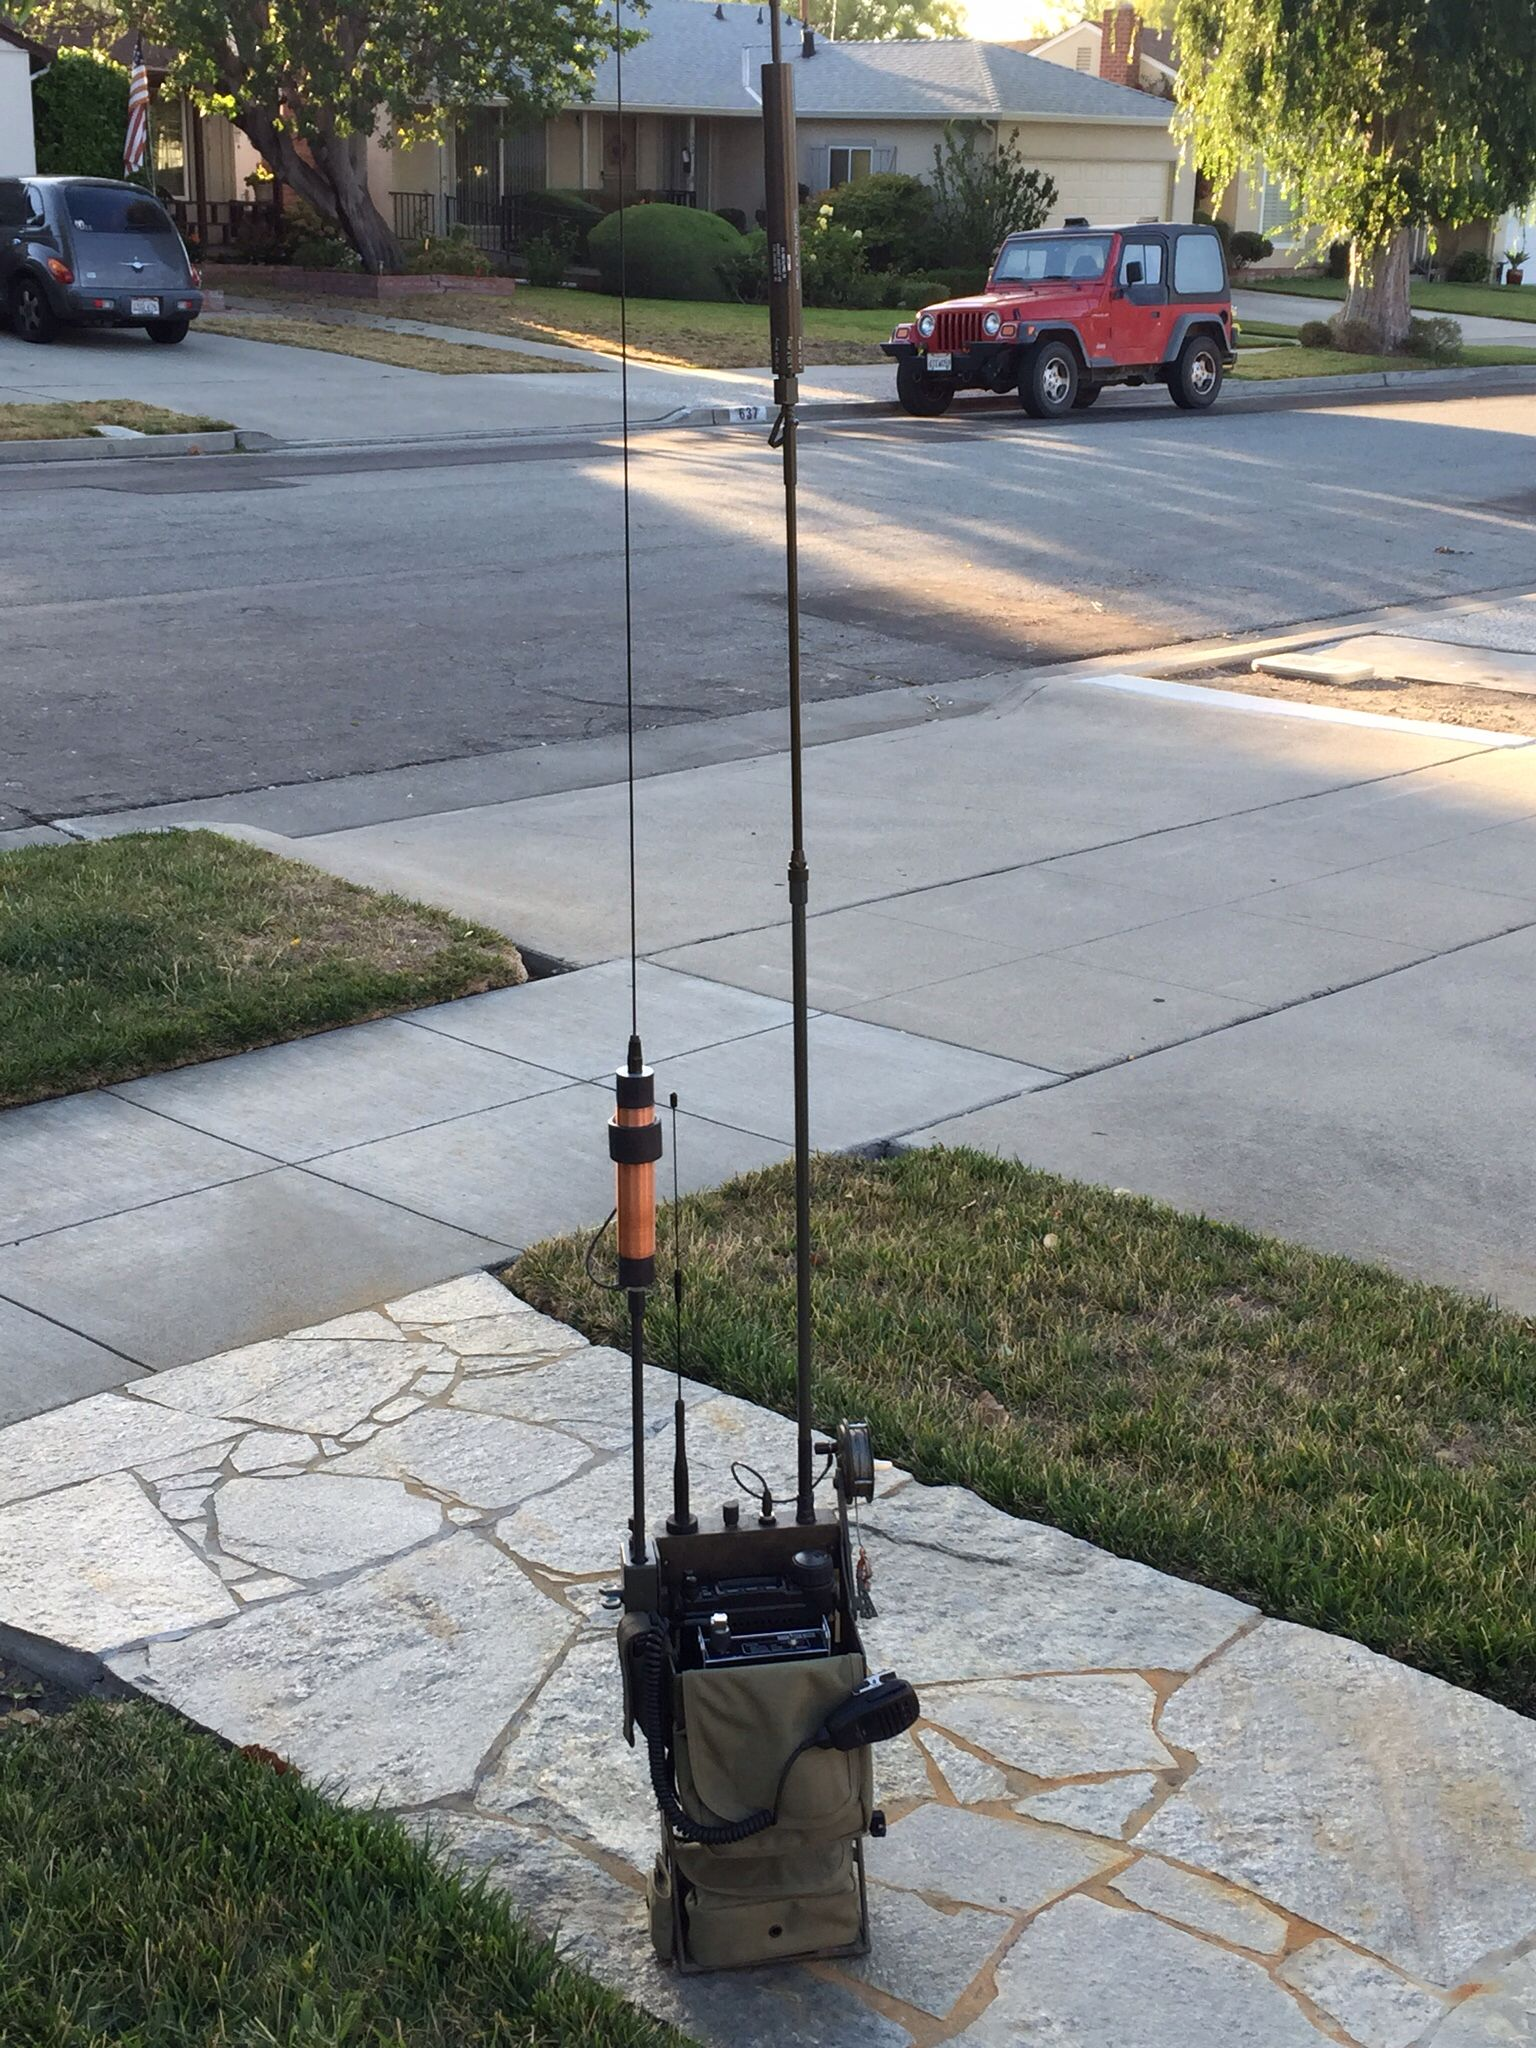 HF Manpack By N6VOA | N6VOA / UTOC | Ham radio antenna, Hf